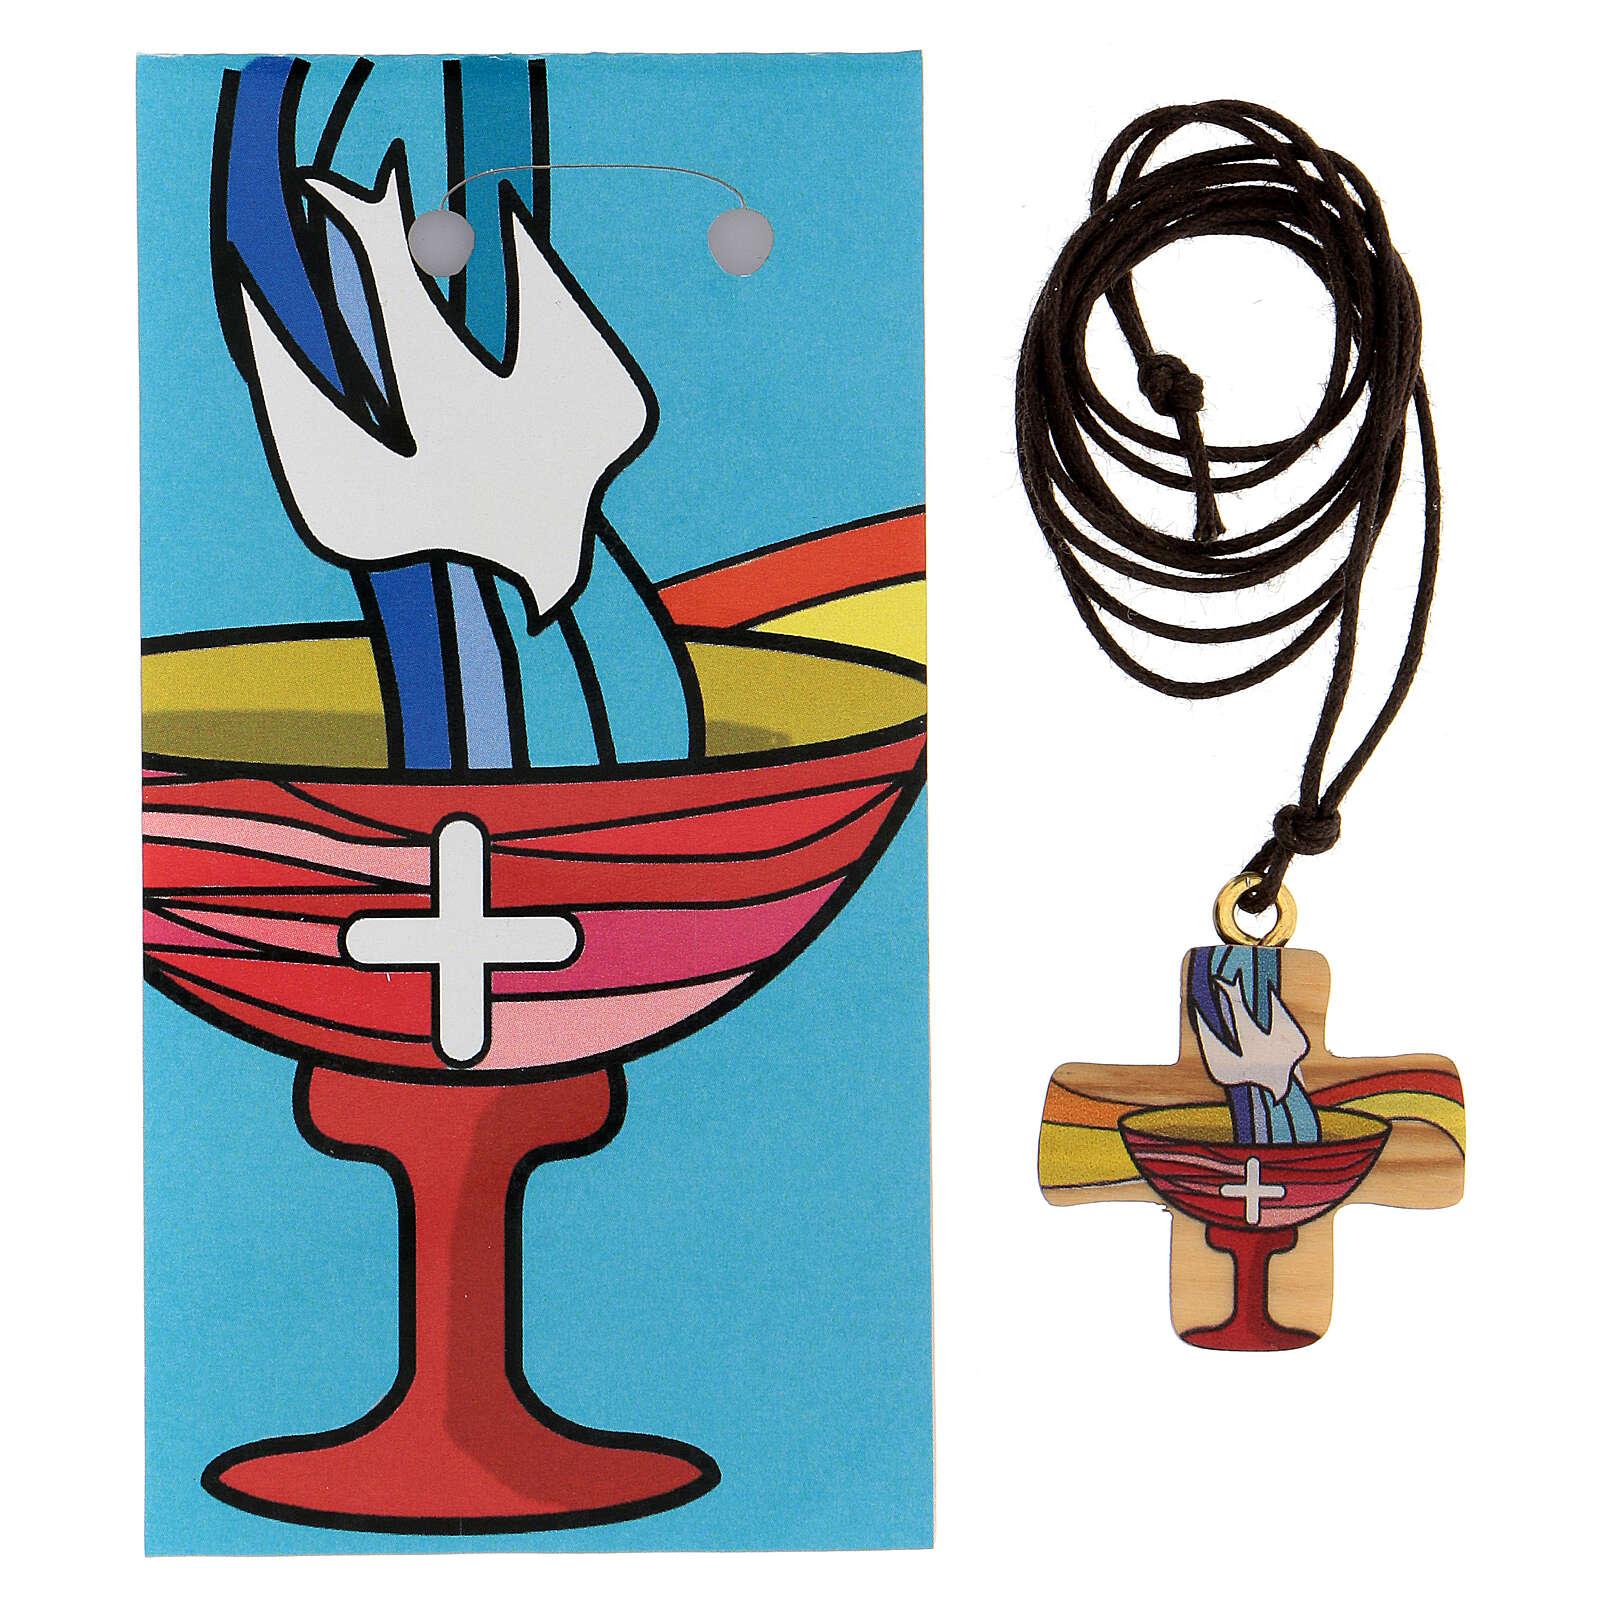 Cruz madera olivo símbolo bautismo 3 cm 4